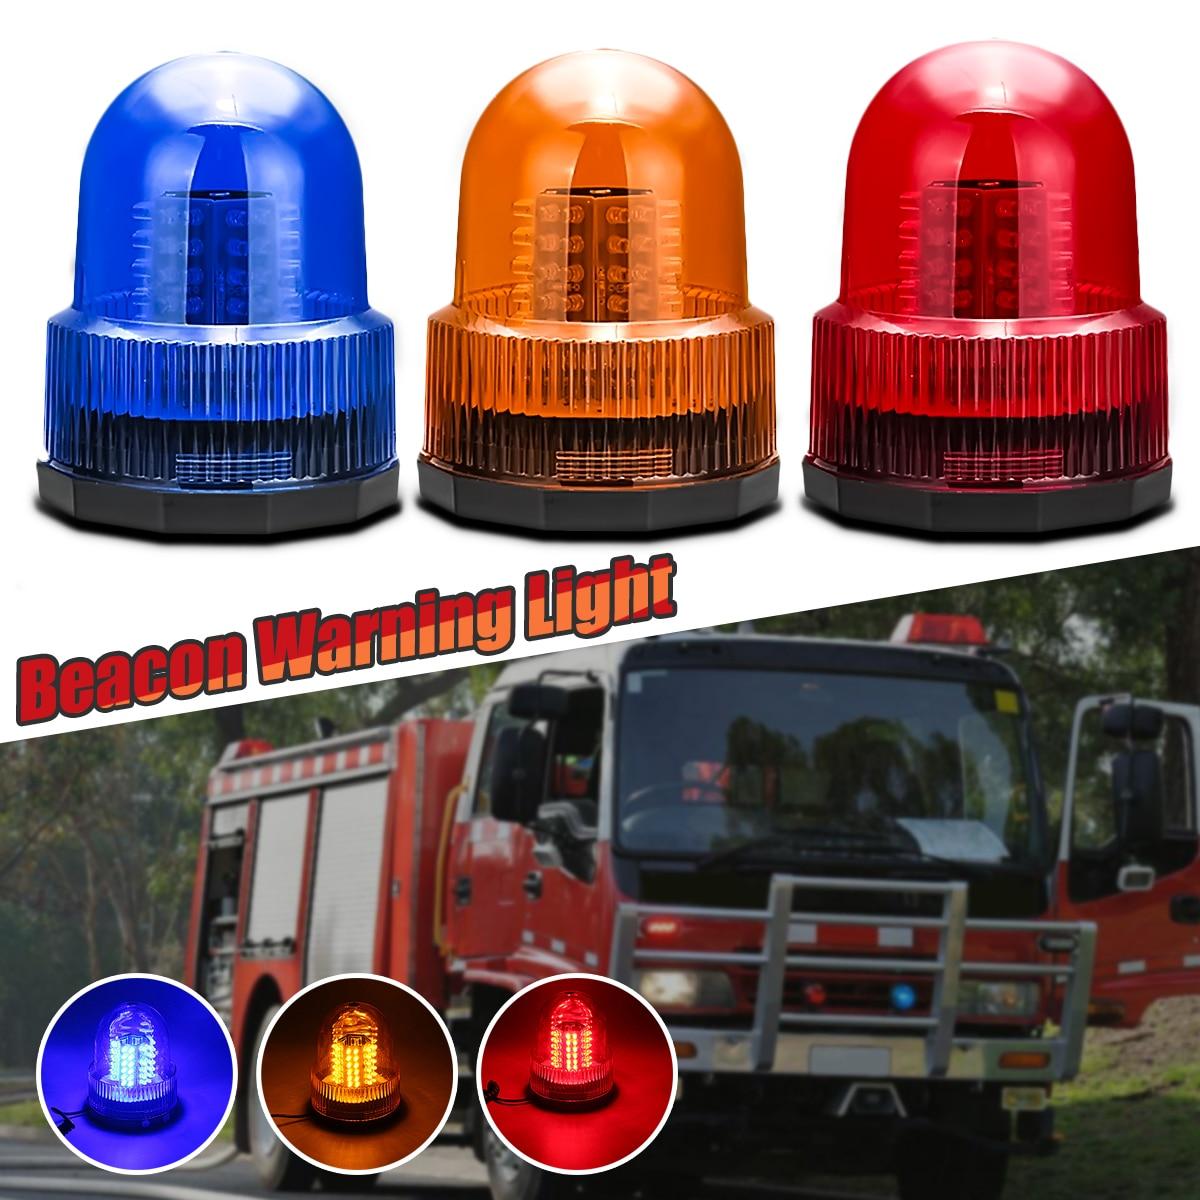 72LED Side Marker Reserving Light Universal For 12V Trucks Trailers Cars Boats Flashing Beacon Warning Light Vortical Flashlight